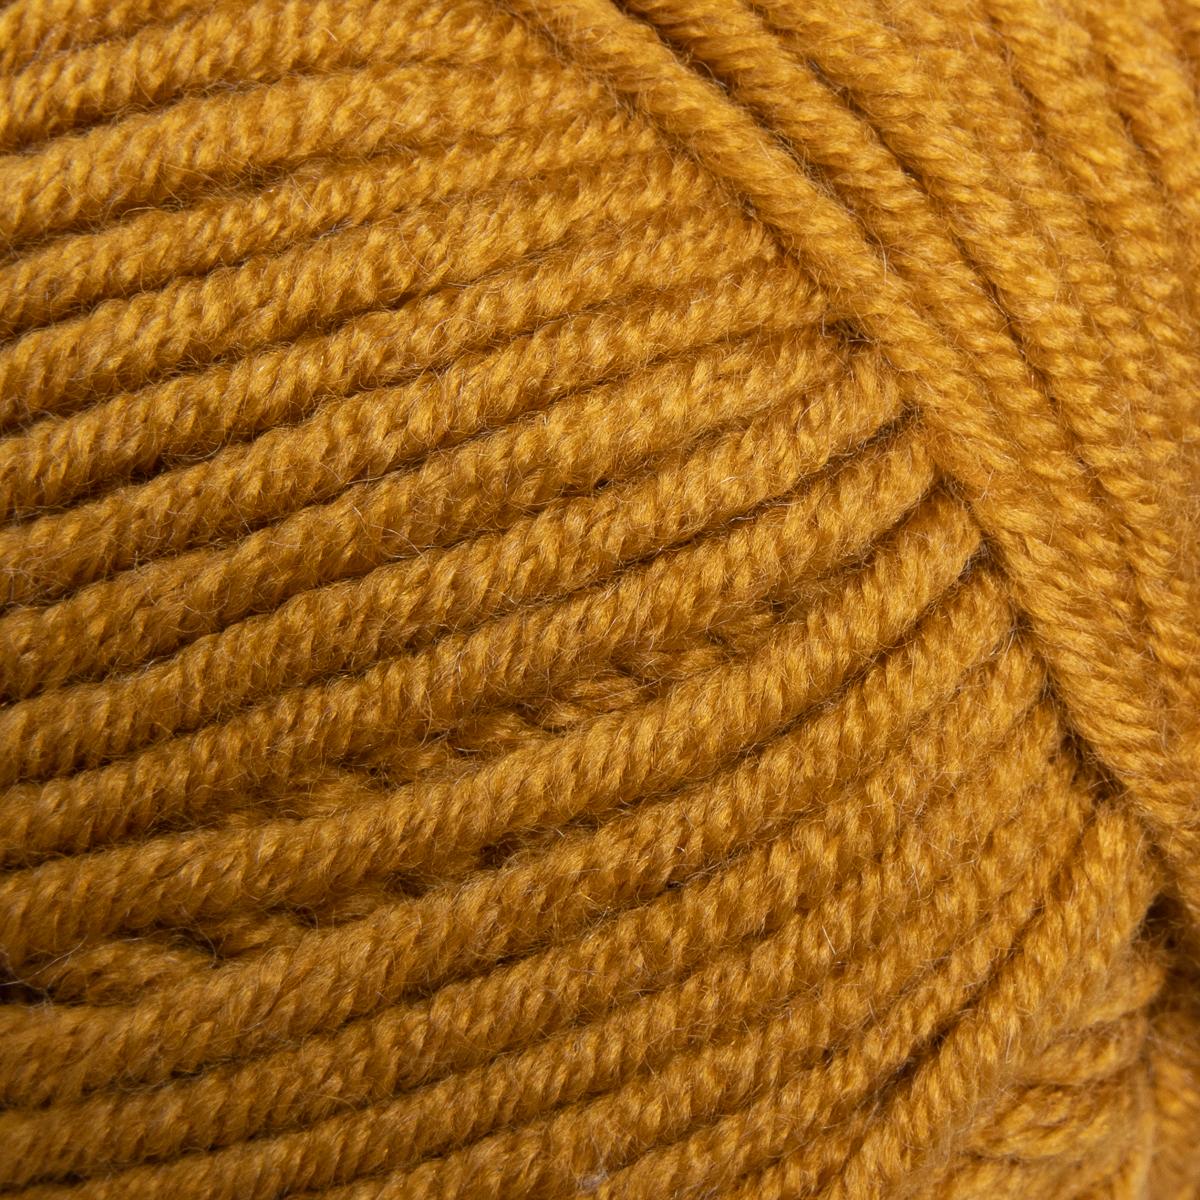 3pk-Lion-Brand-Woolspun-Acrylic-amp-Wool-Yarn-Bulky-5-Knit-Crocheting-Skeins-Soft thumbnail 43